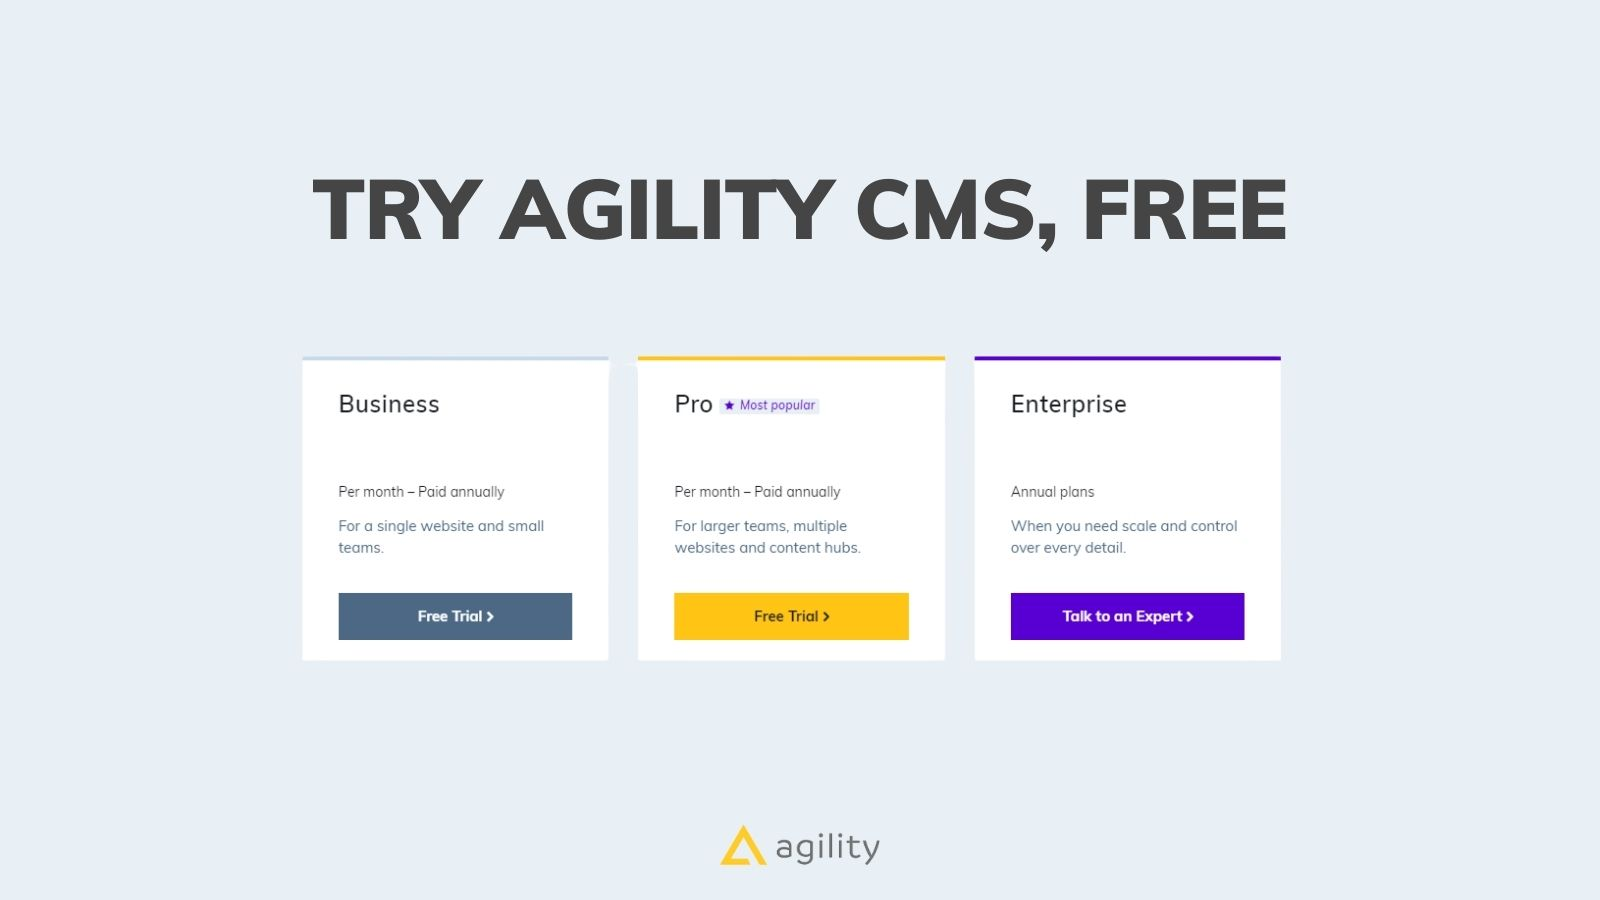 Visualizing workflow on agilitycms.com